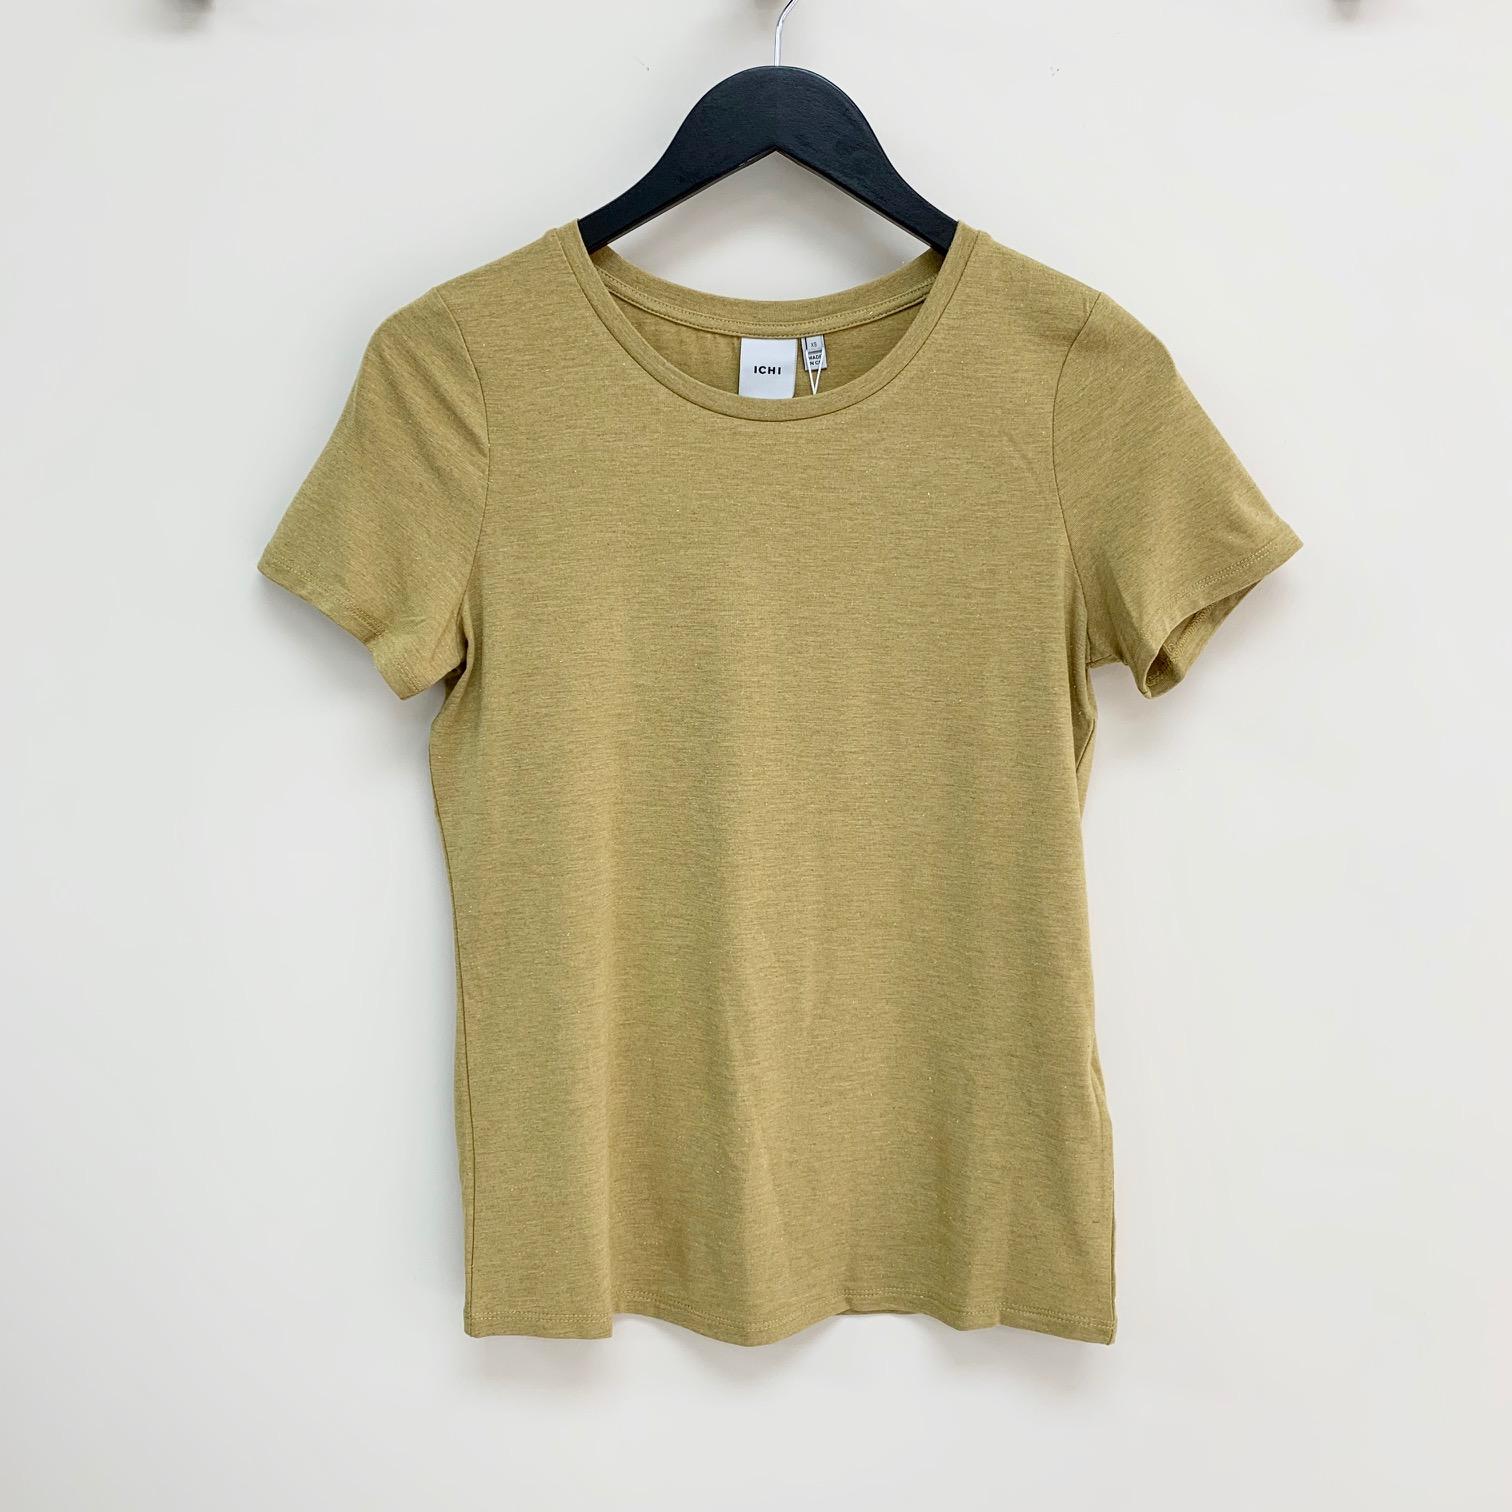 Rebel Sparkle T-shirt